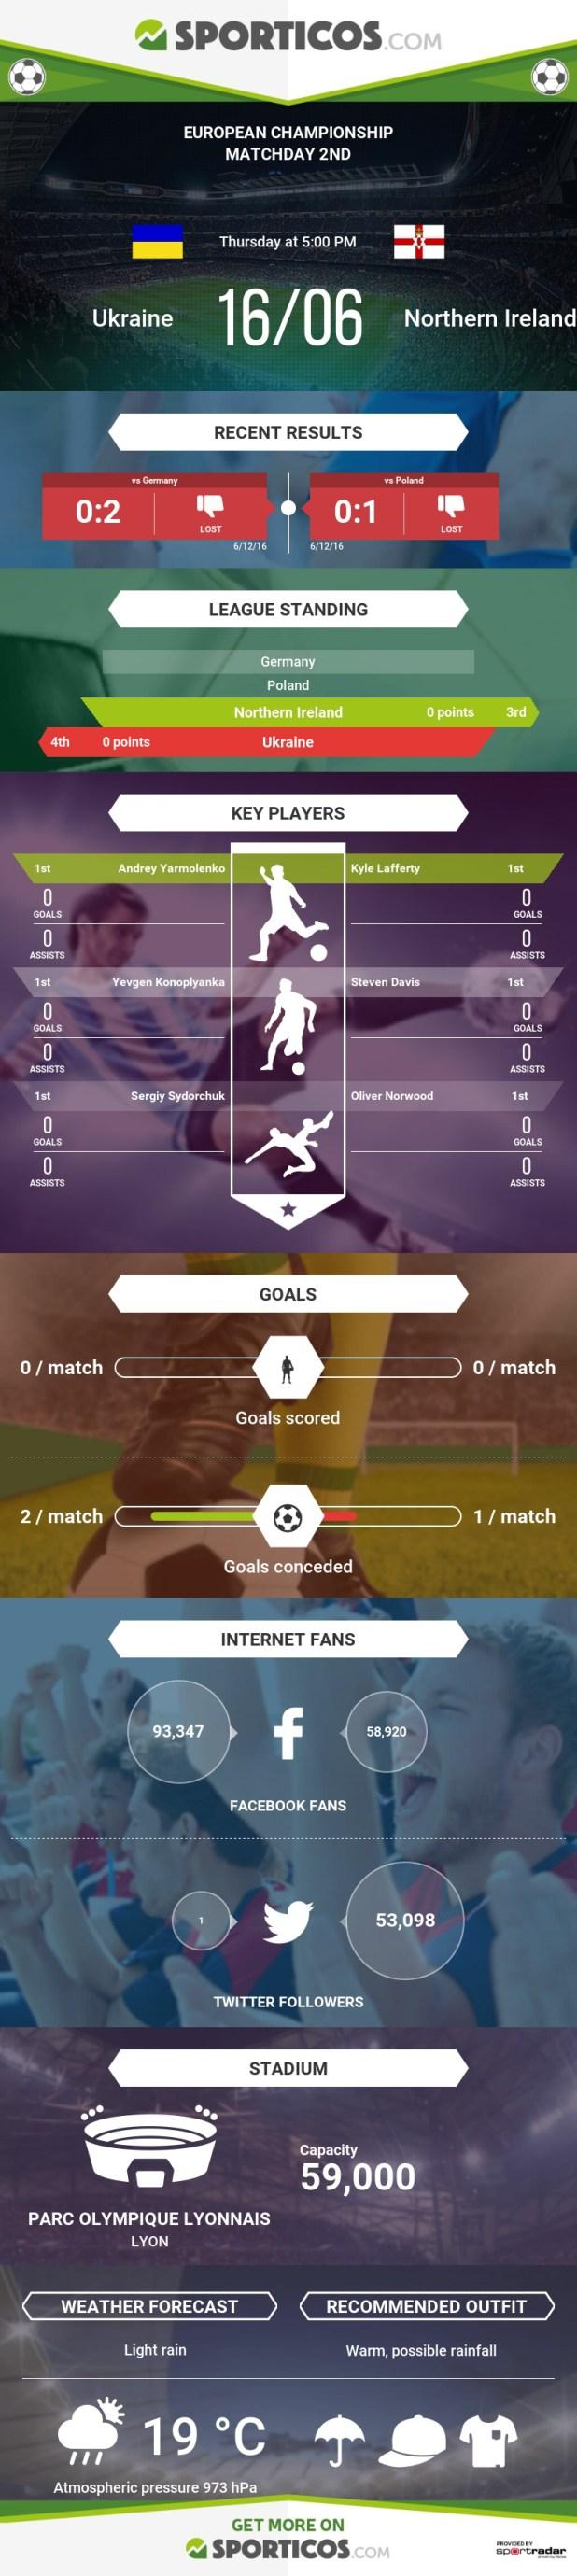 Sporticos_com_ukraine_vs_northern_ireland